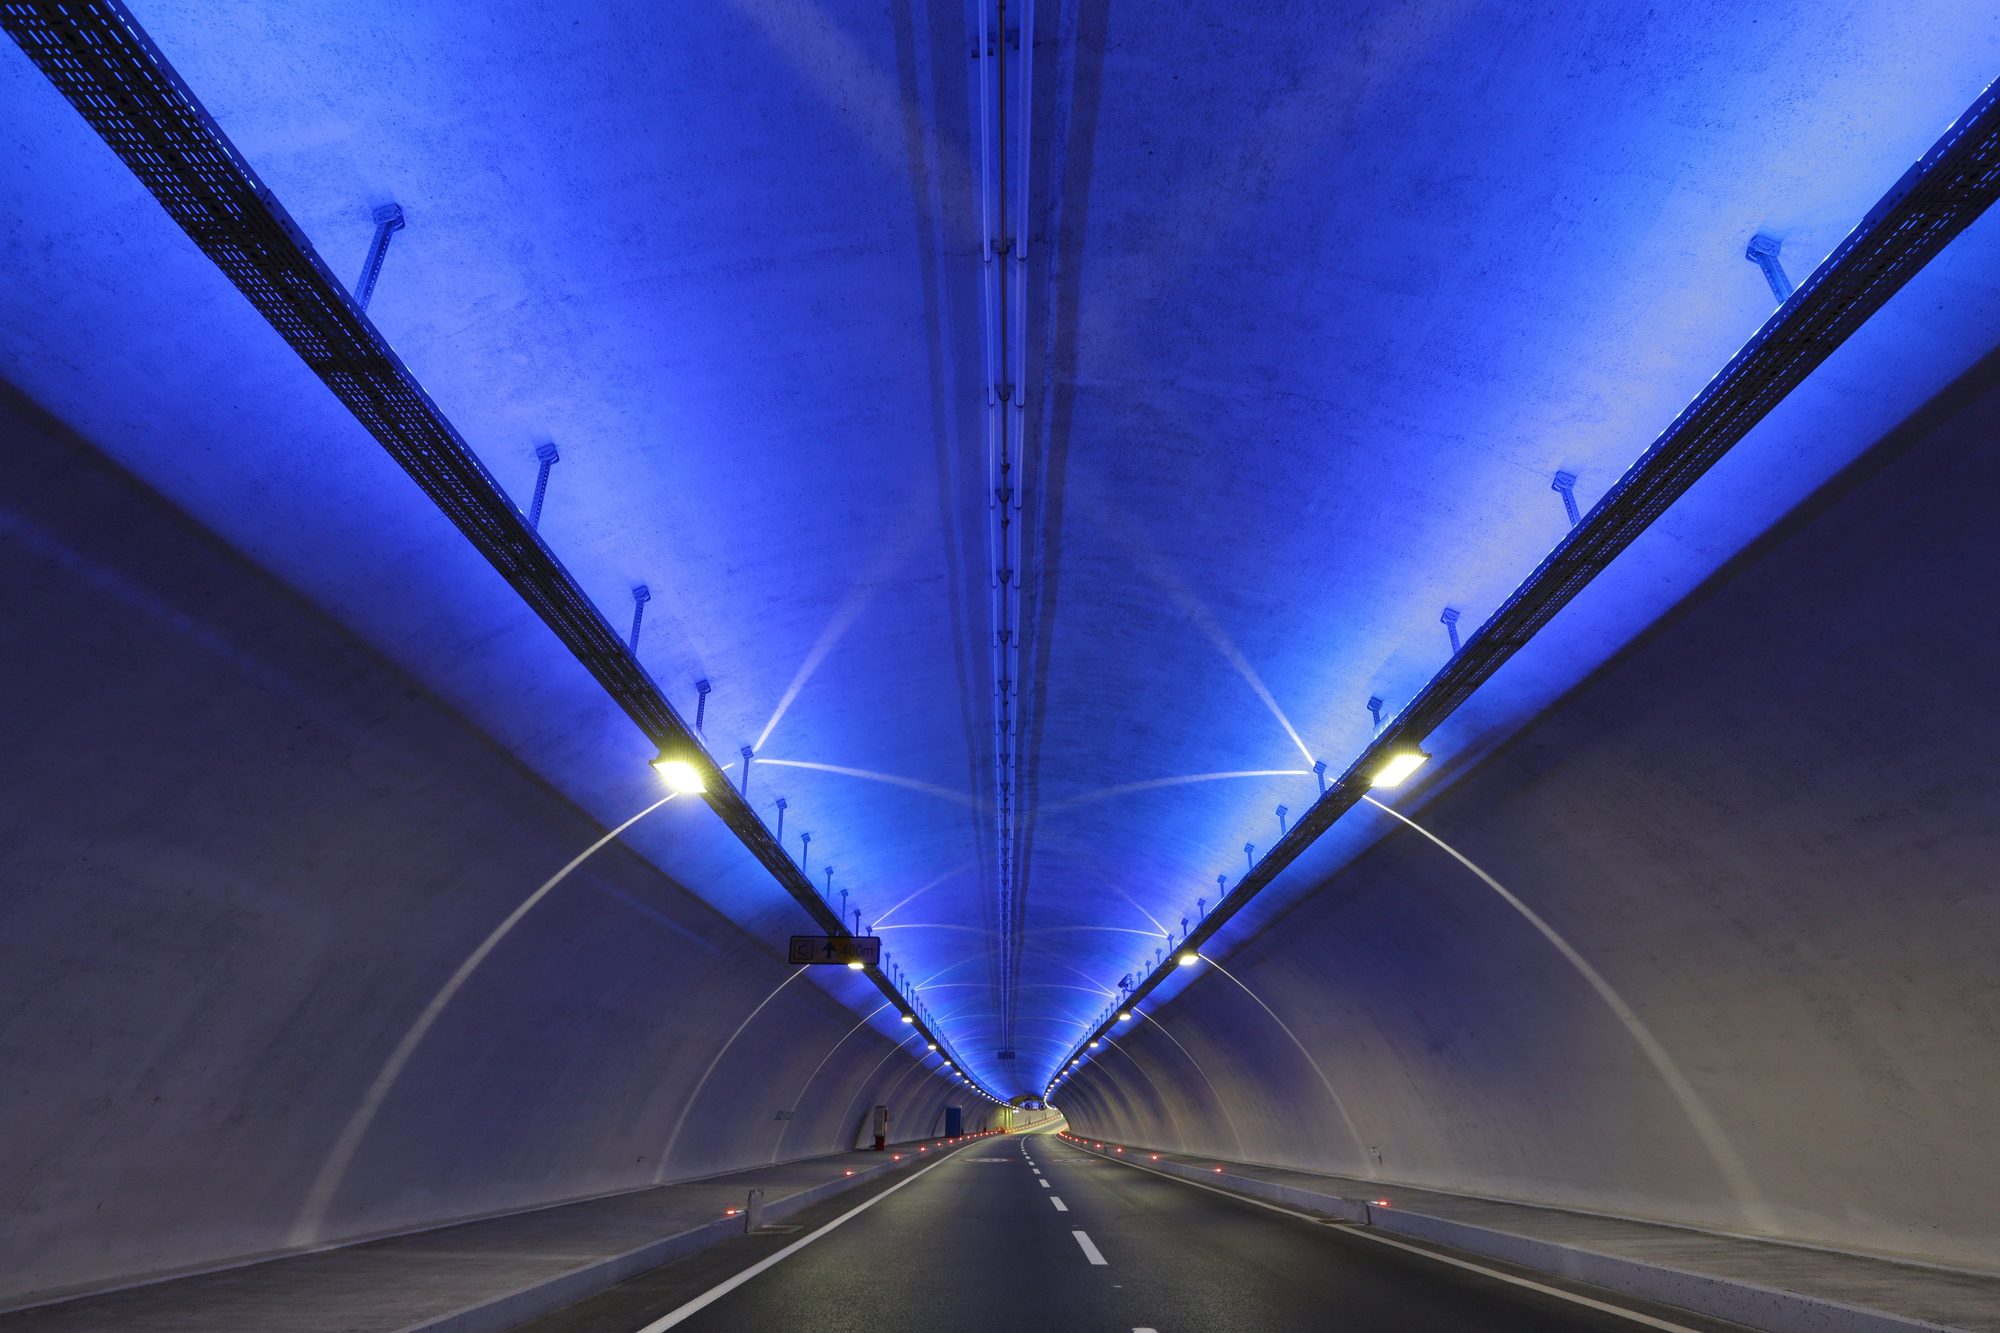 L'Eurasia Tunnel vince l'IES Illumination Award of Merit